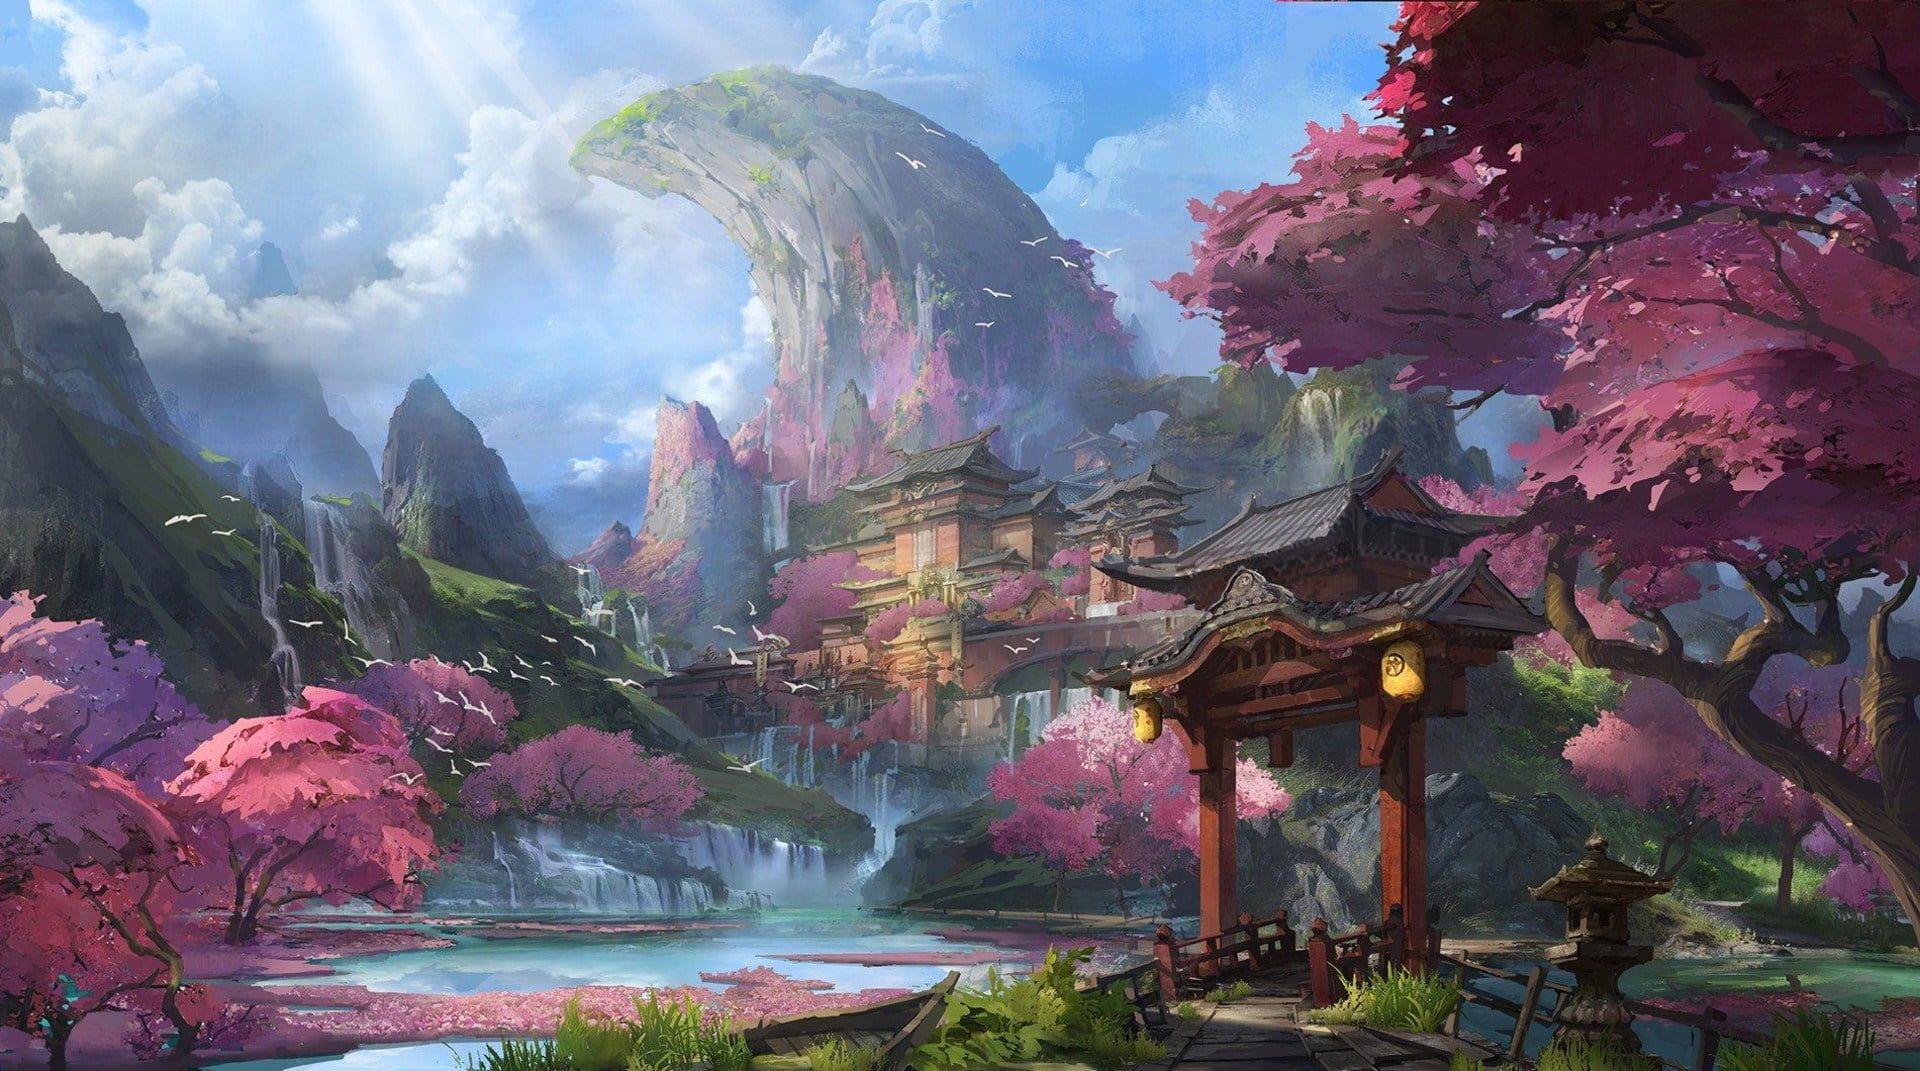 artwork fantasy art Chinese architecture mountains